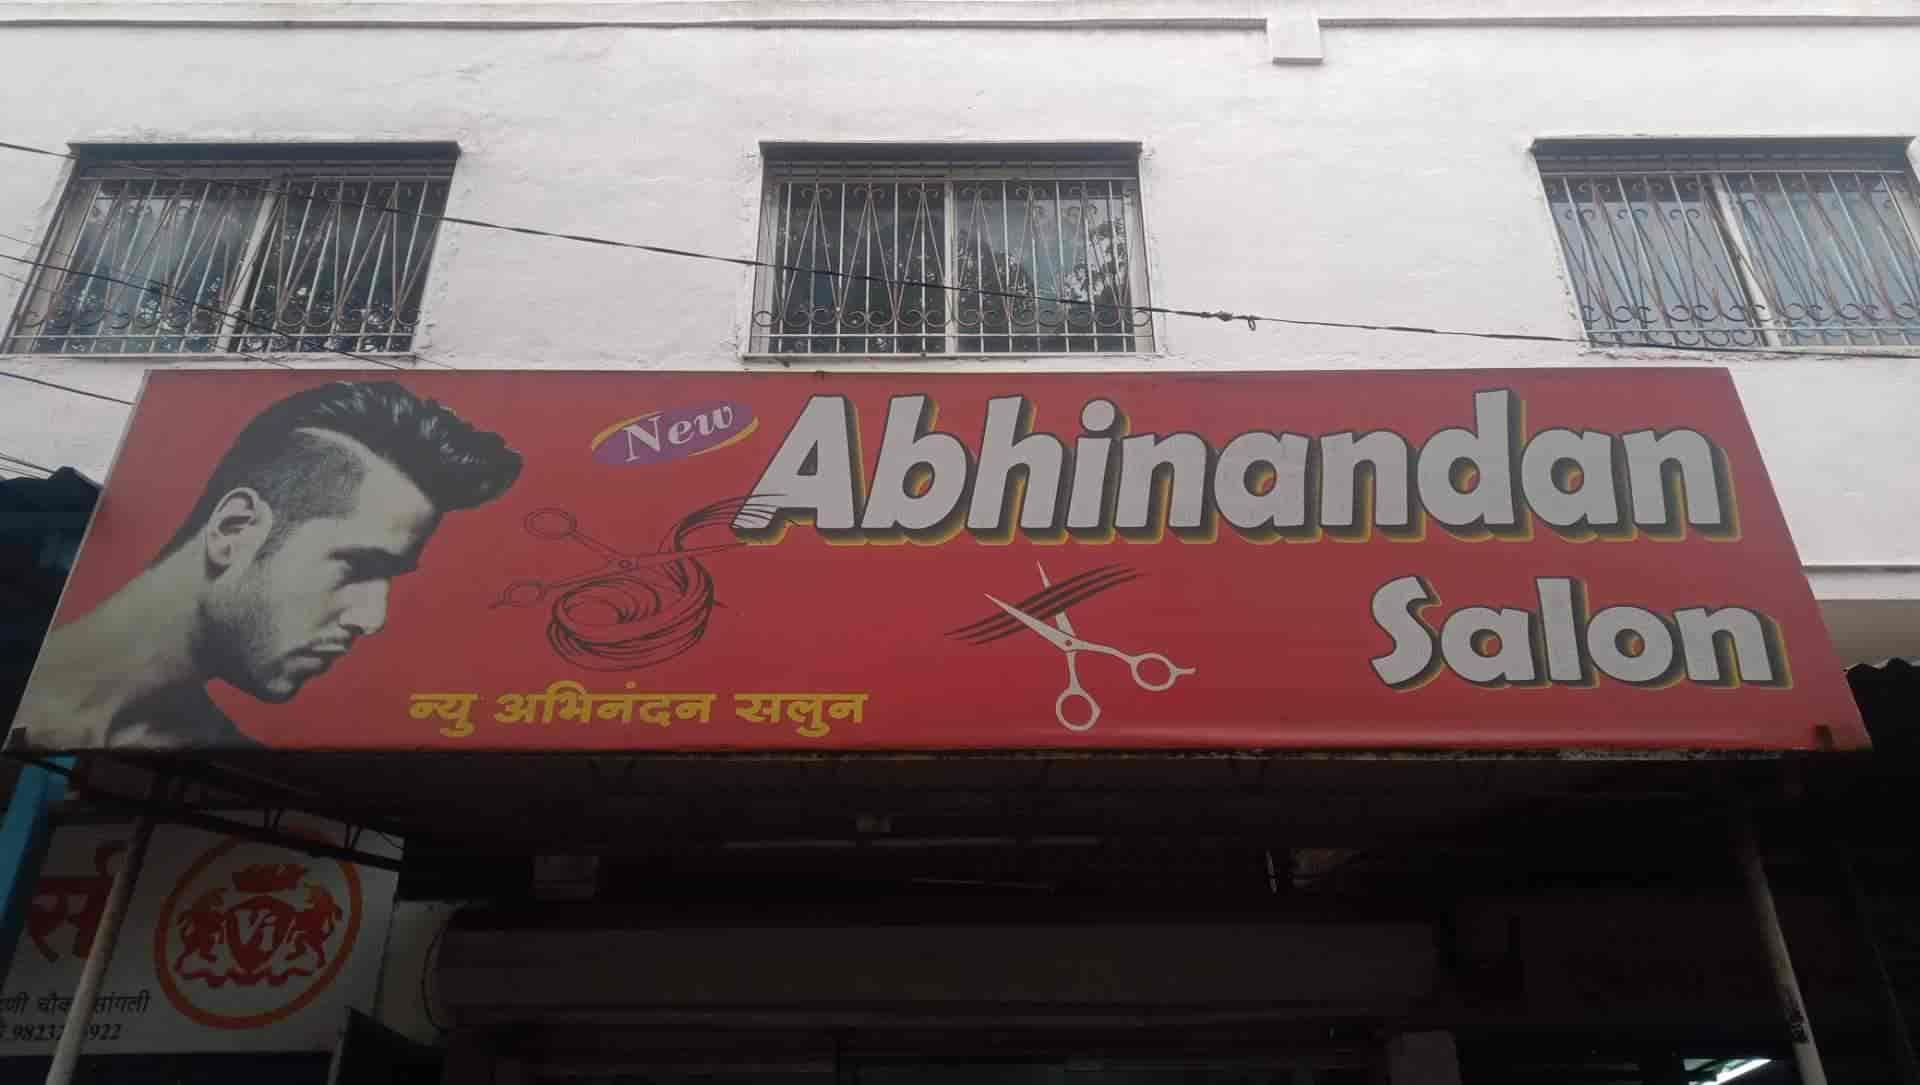 New Abhinandan Saloon Photos, CHANDNI CHOWK, Sangli